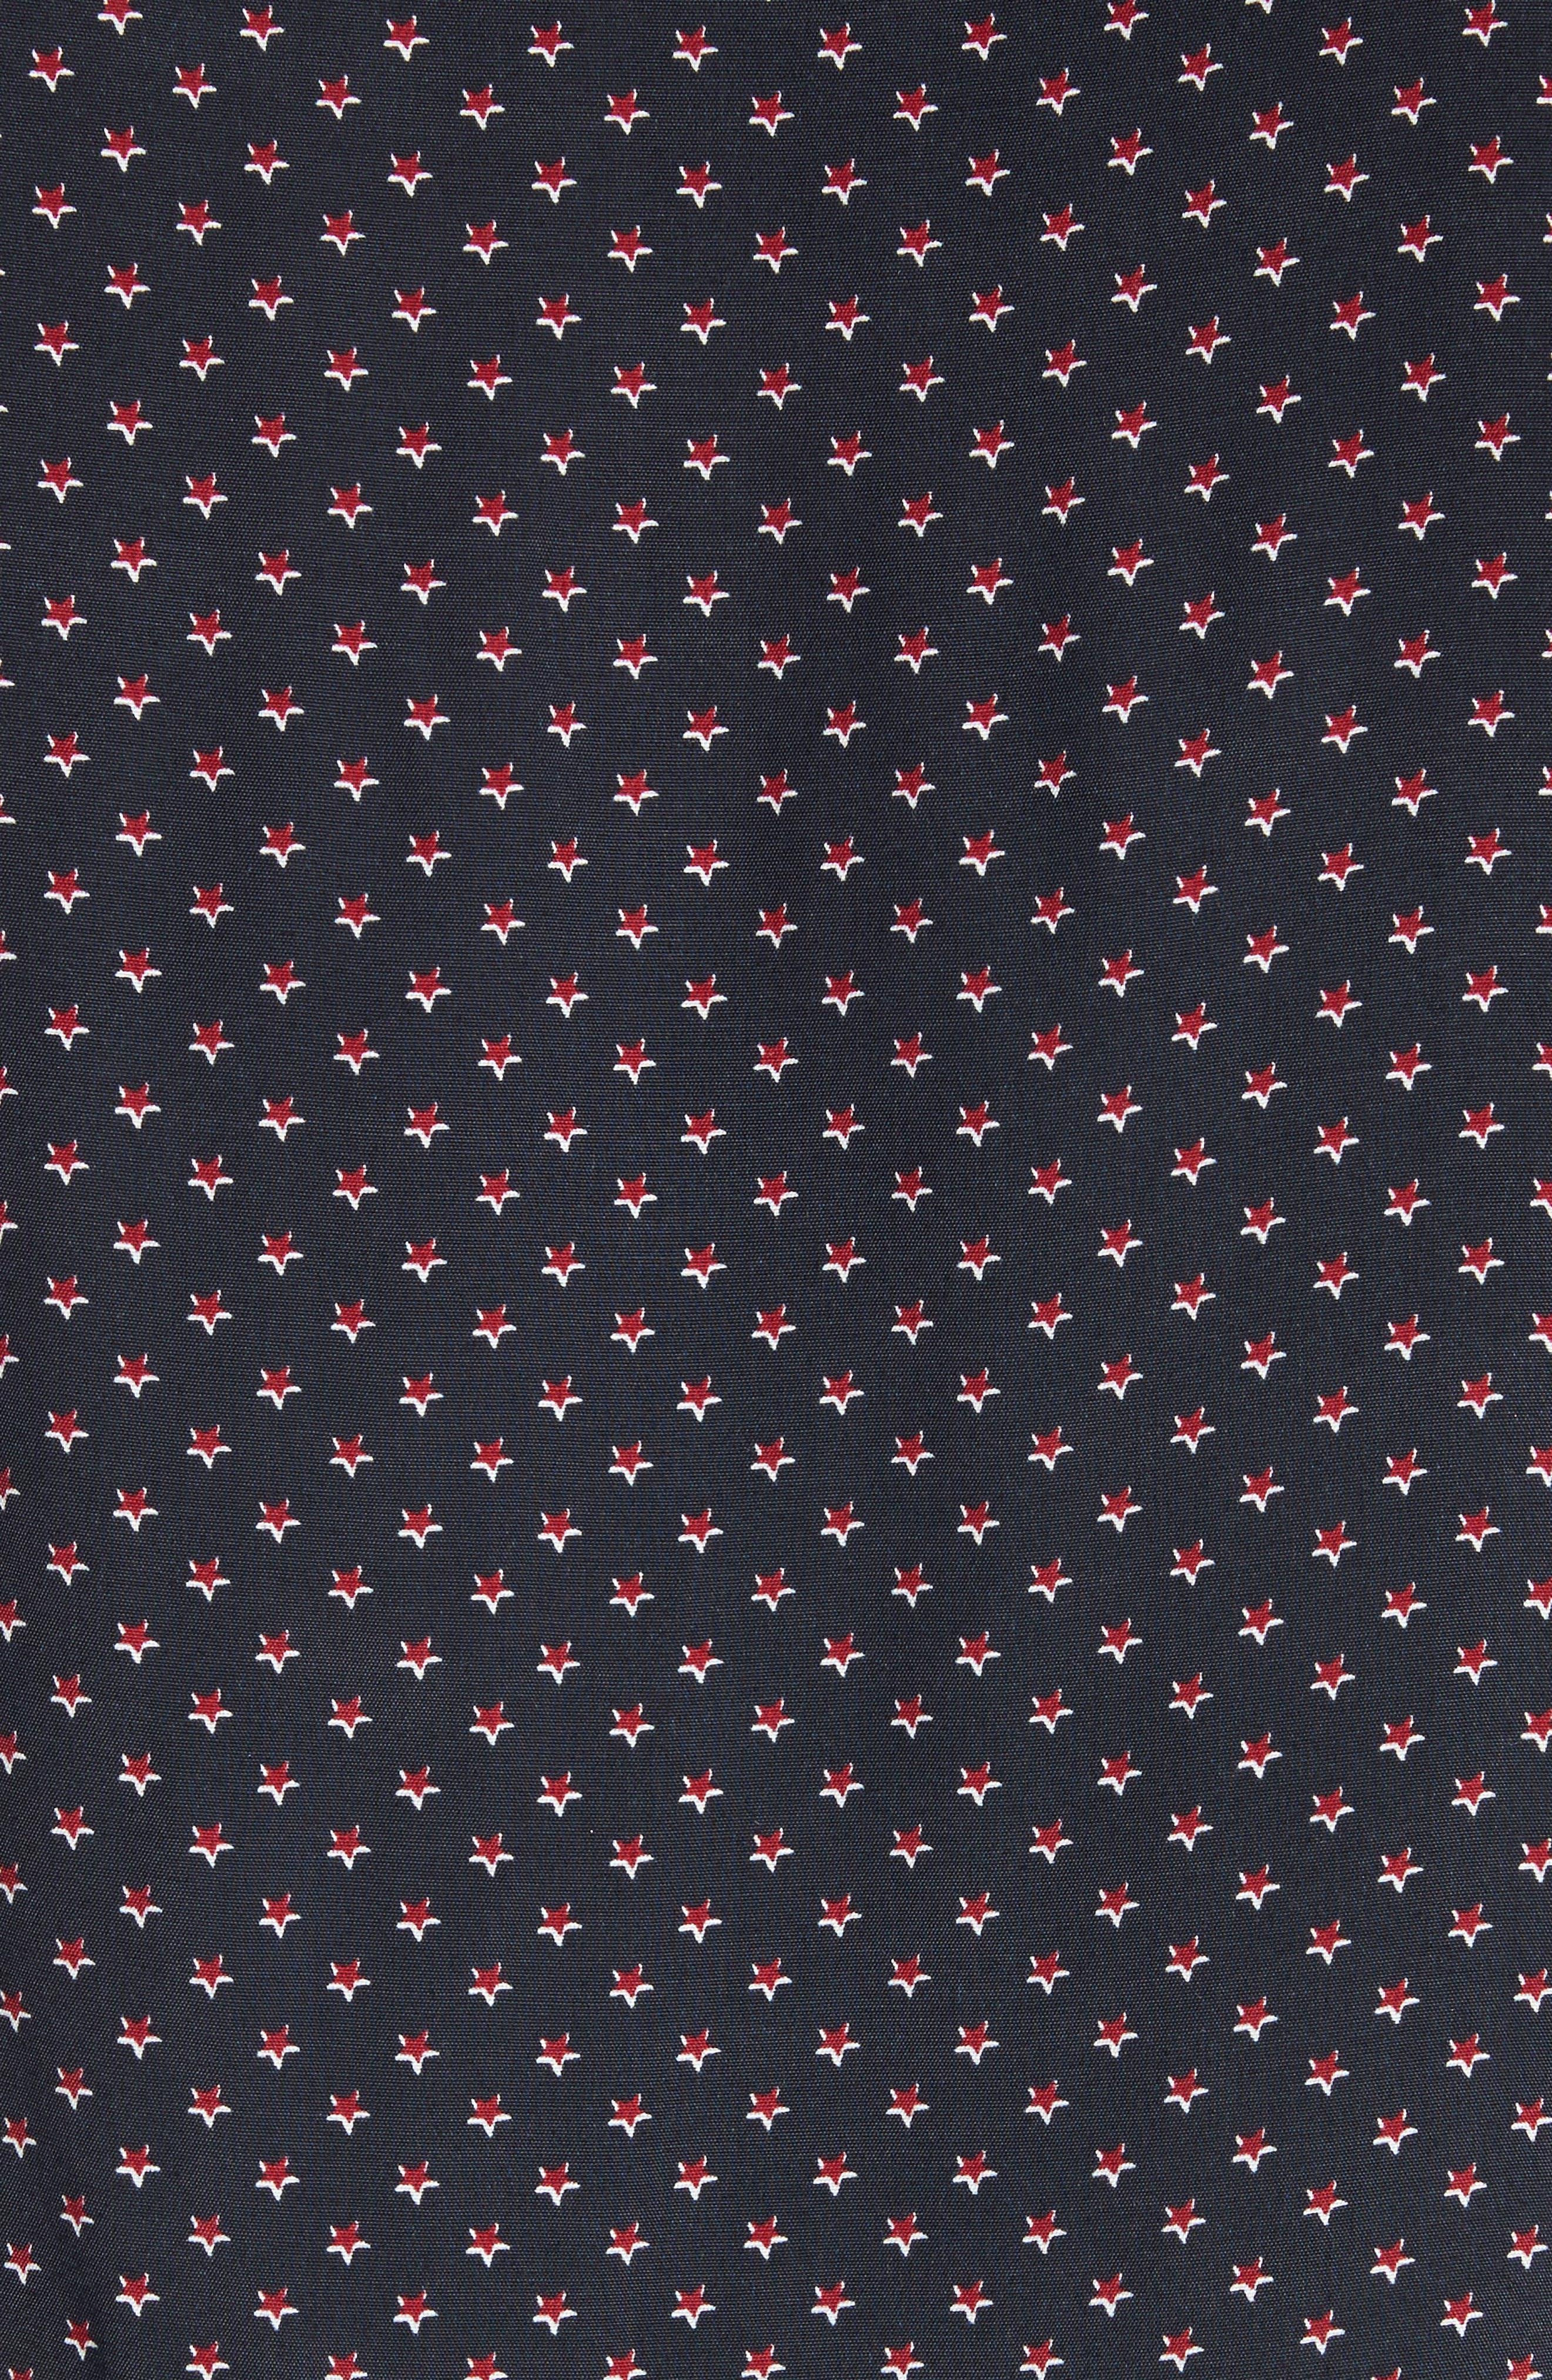 Star Print Shirt,                             Alternate thumbnail 5, color,                             Navy